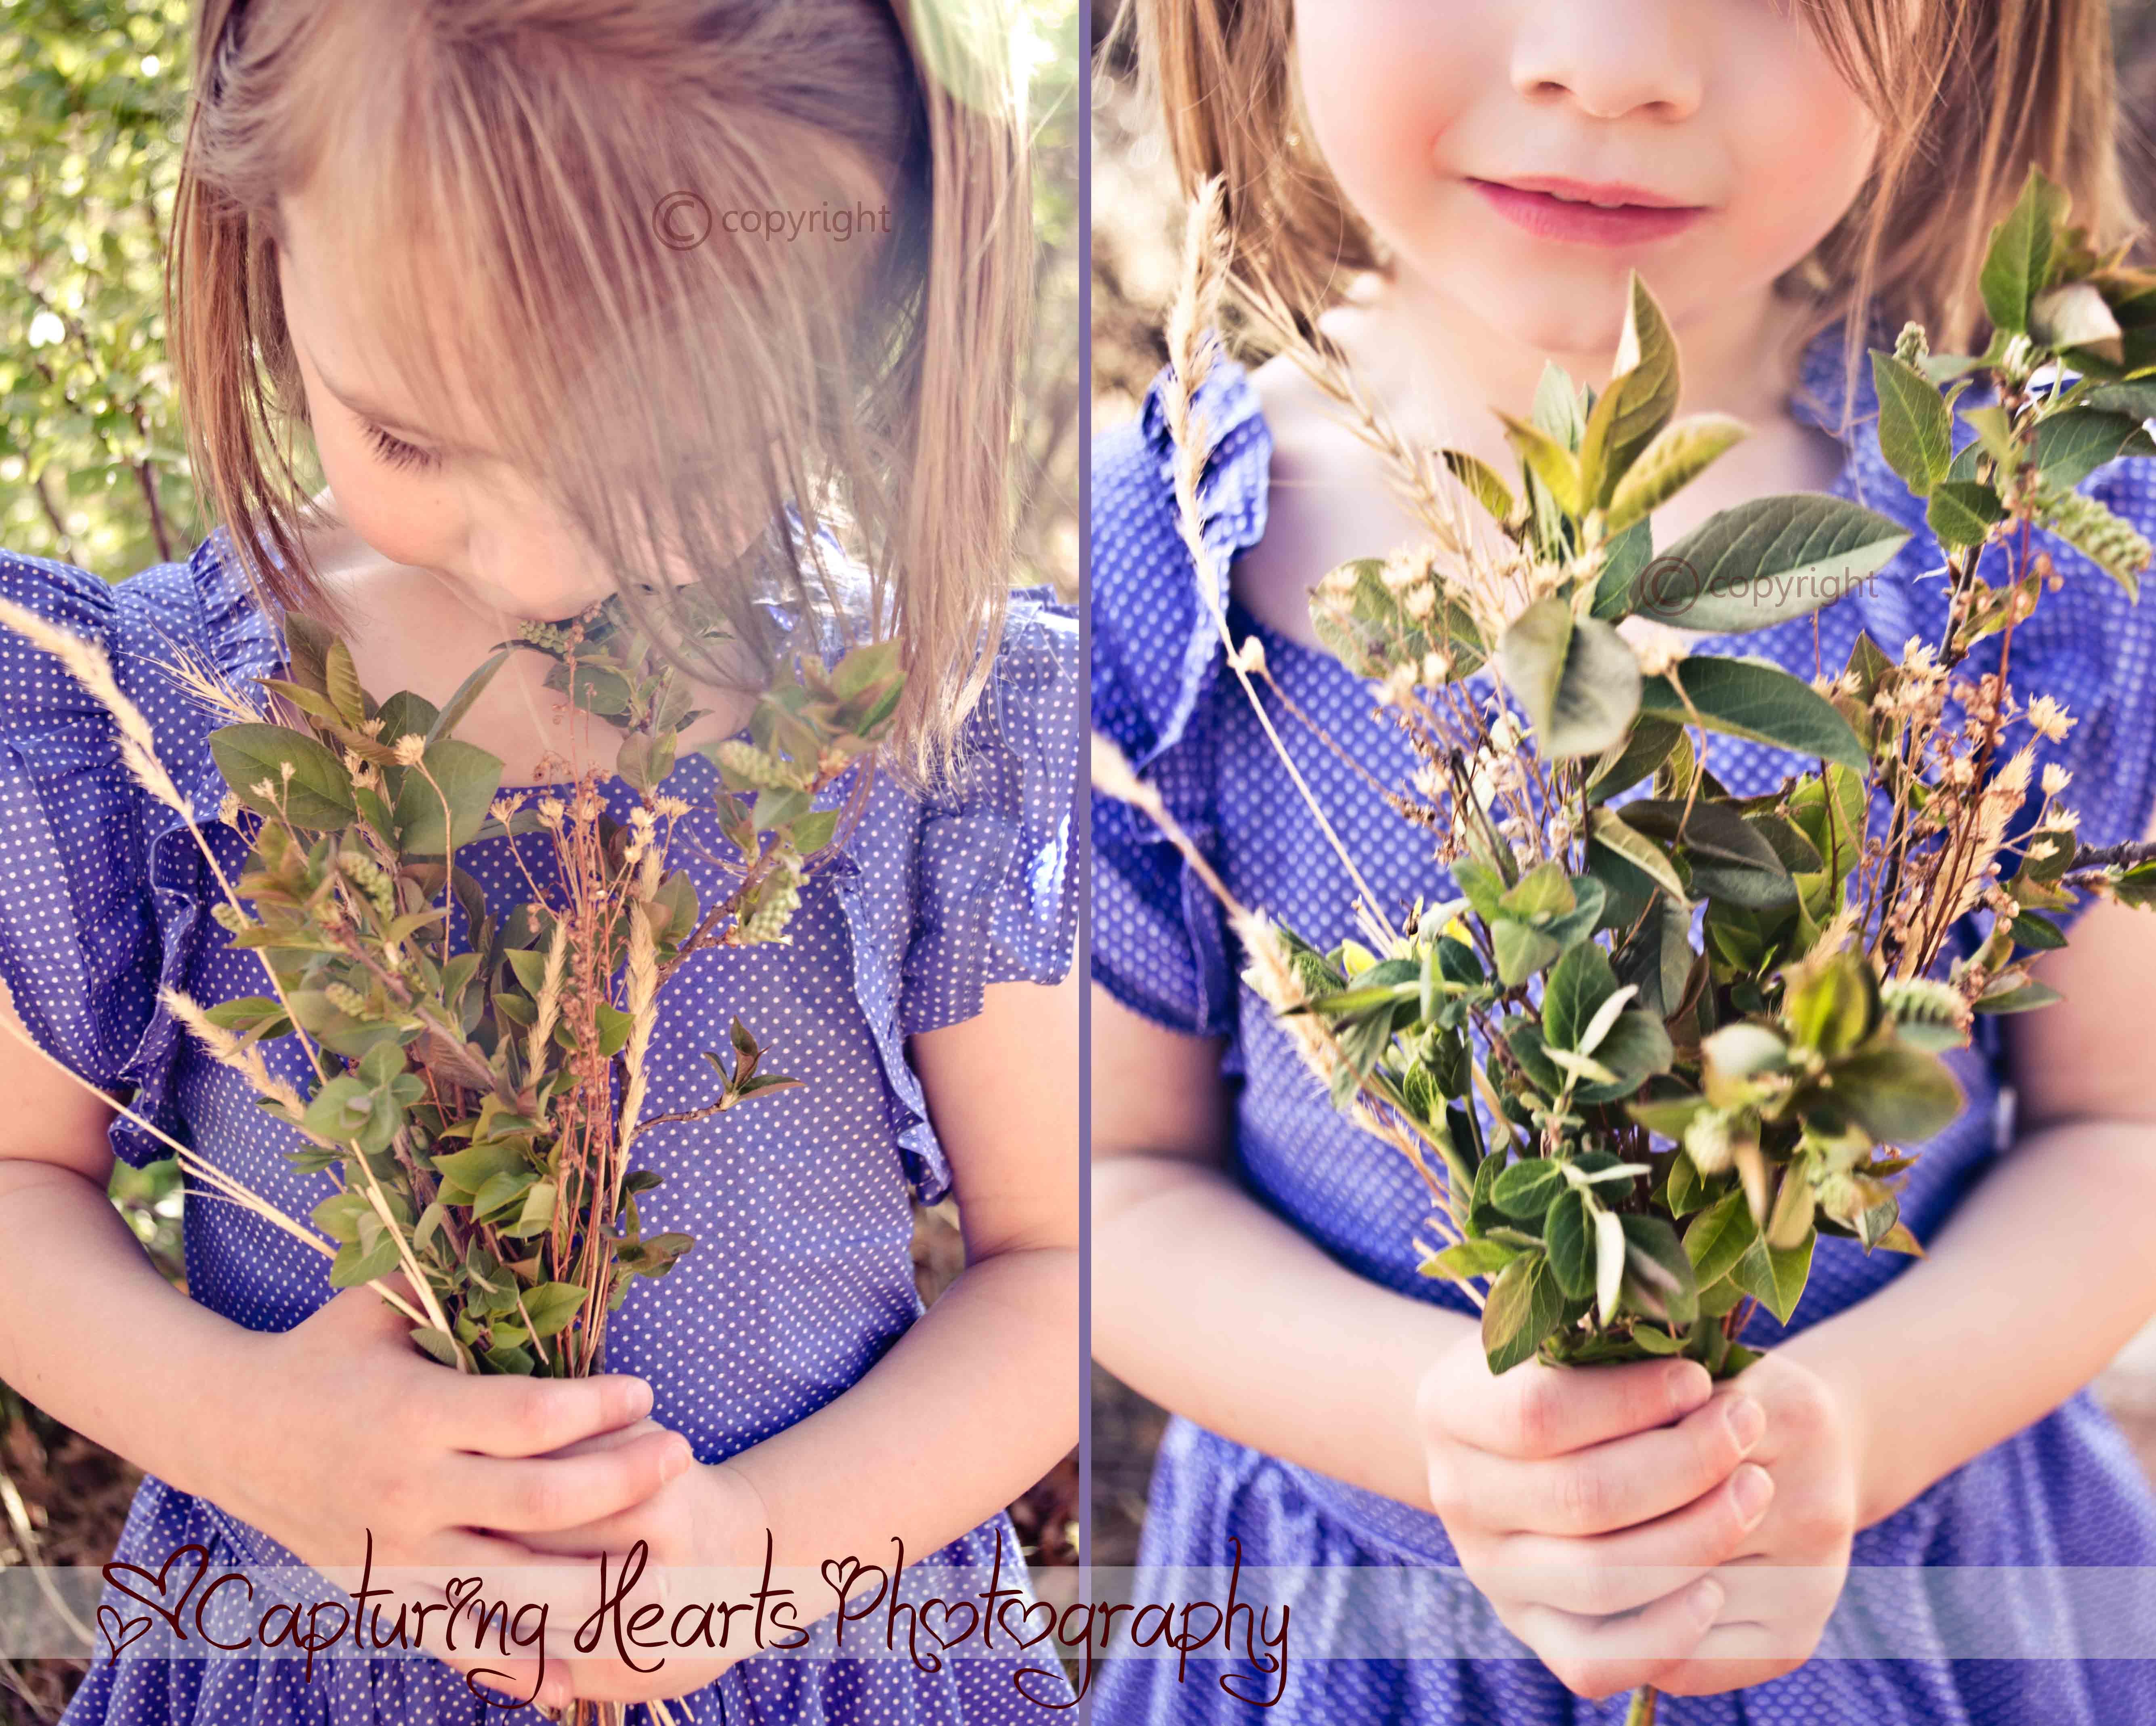 Garden+of+the+God+Photshoot+Colorado+Springs+Child+Model+COPYRIGHT+LQ